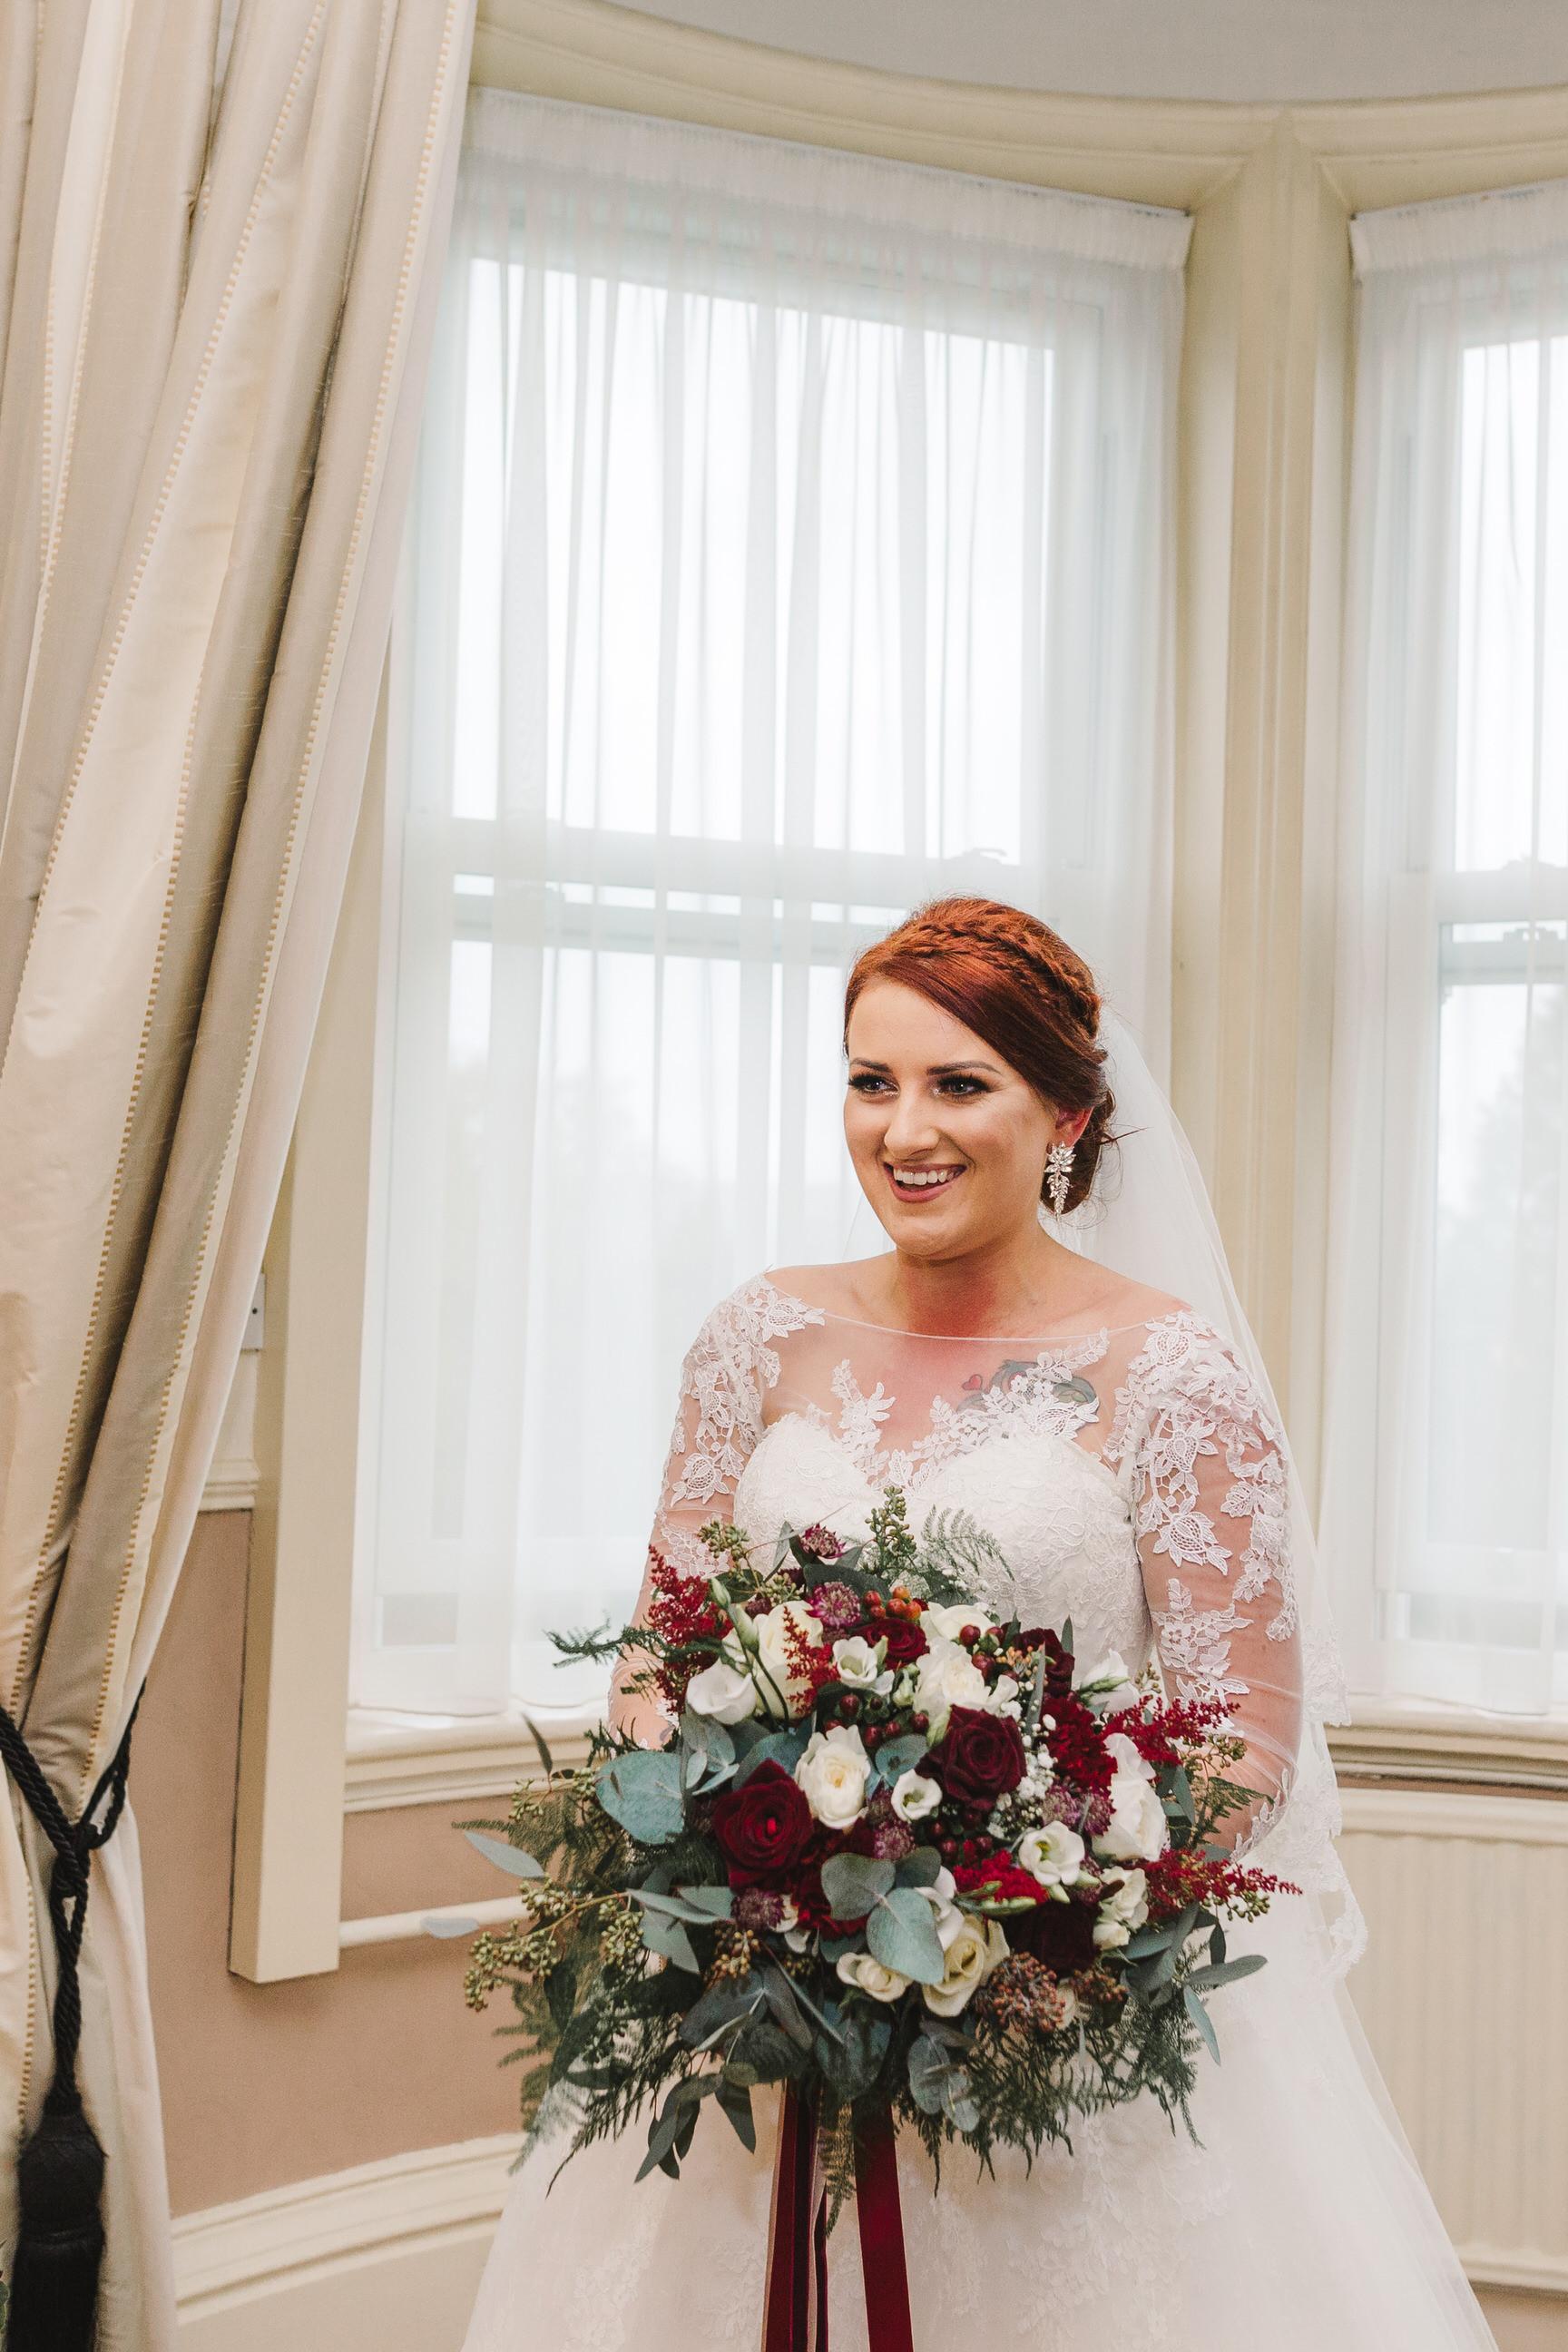 ilkley-west-yorkshire-wedding-114.jpg